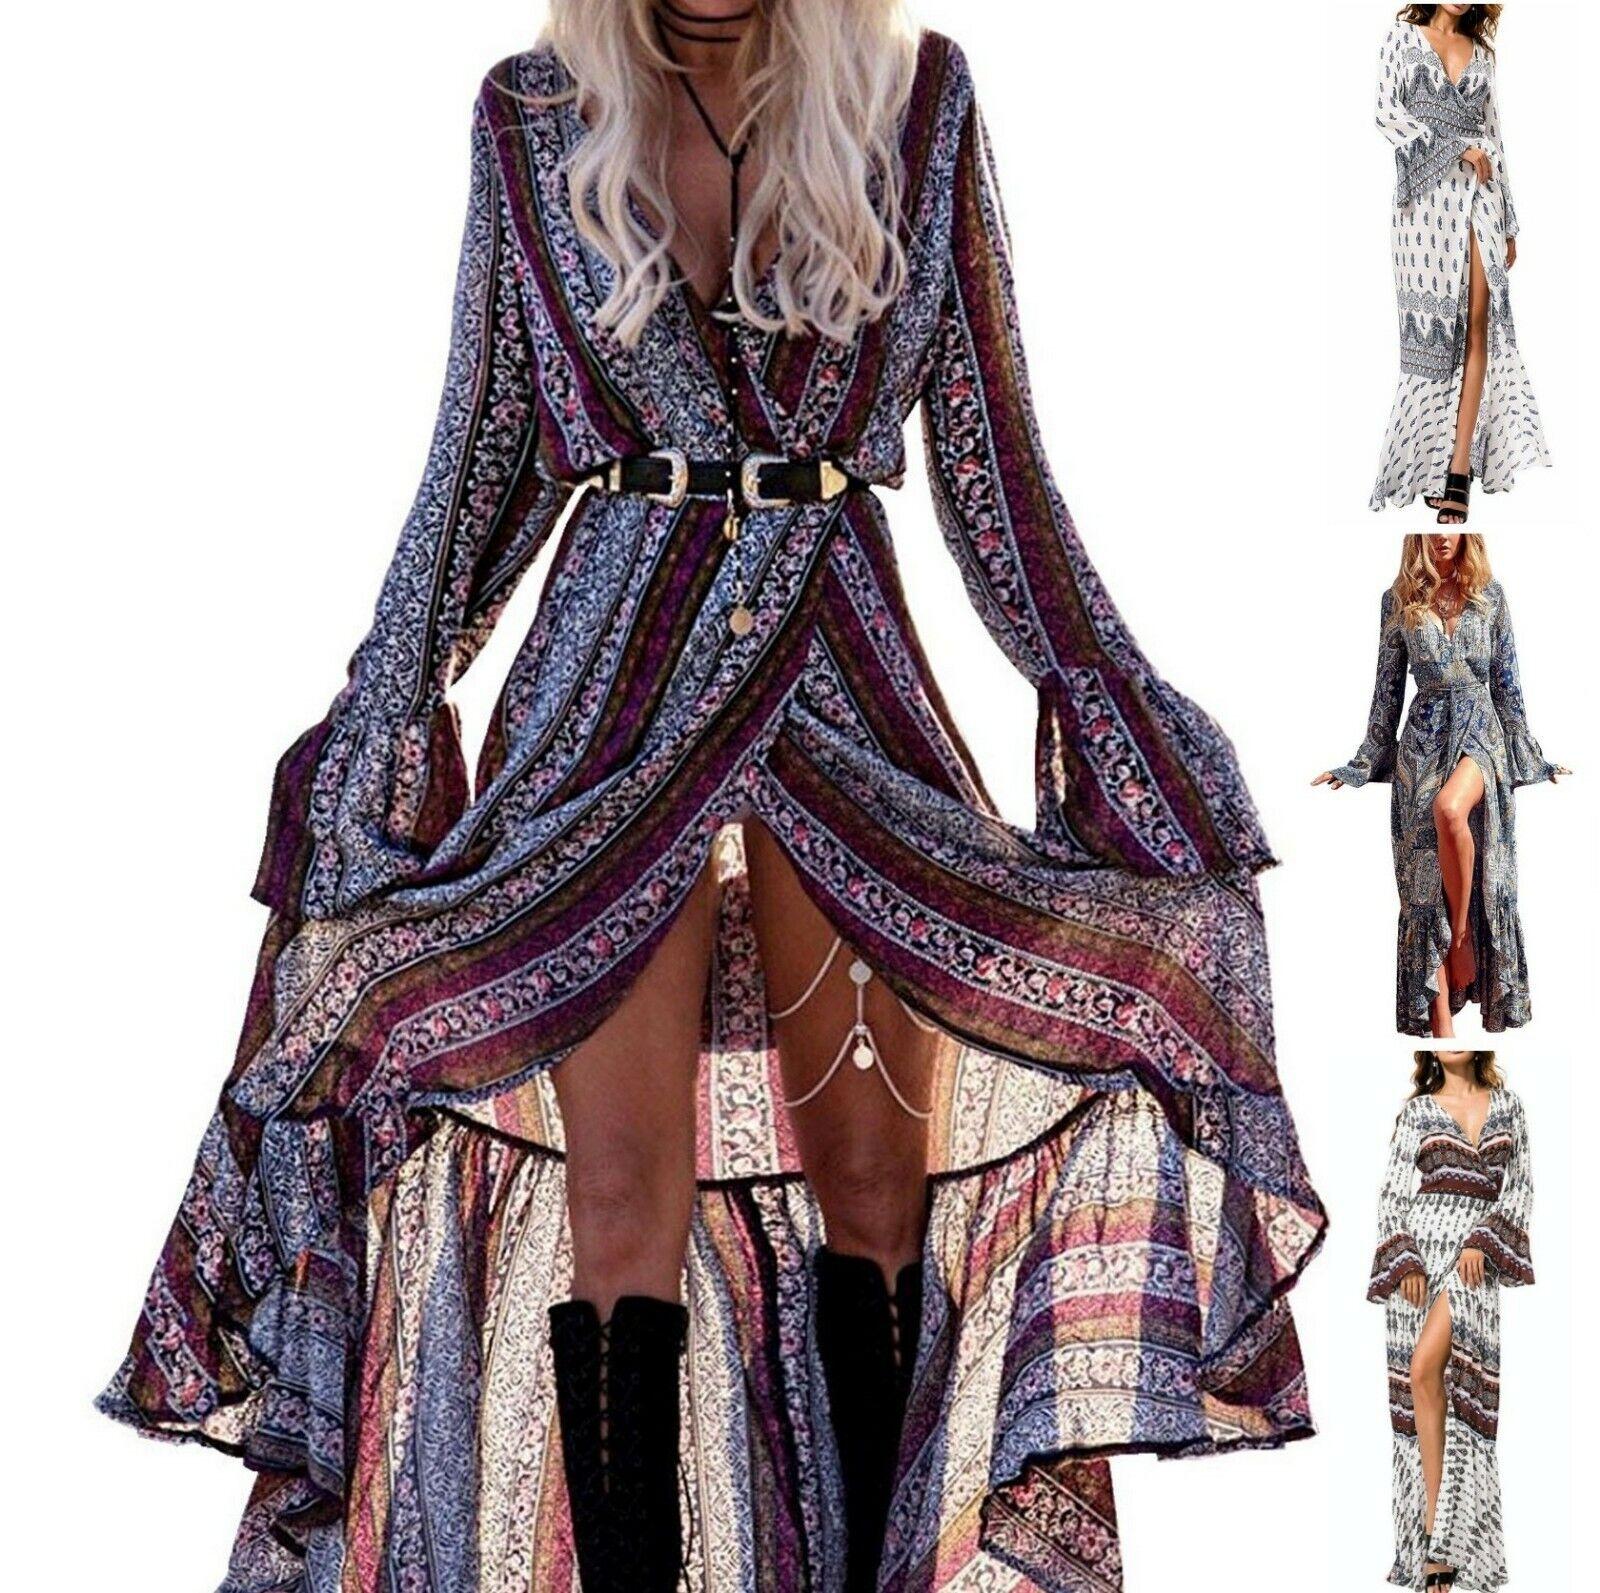 Summer Cardigan Sexy Maxi Long Dress   Long Sleeve  Froral Print   2 day ship